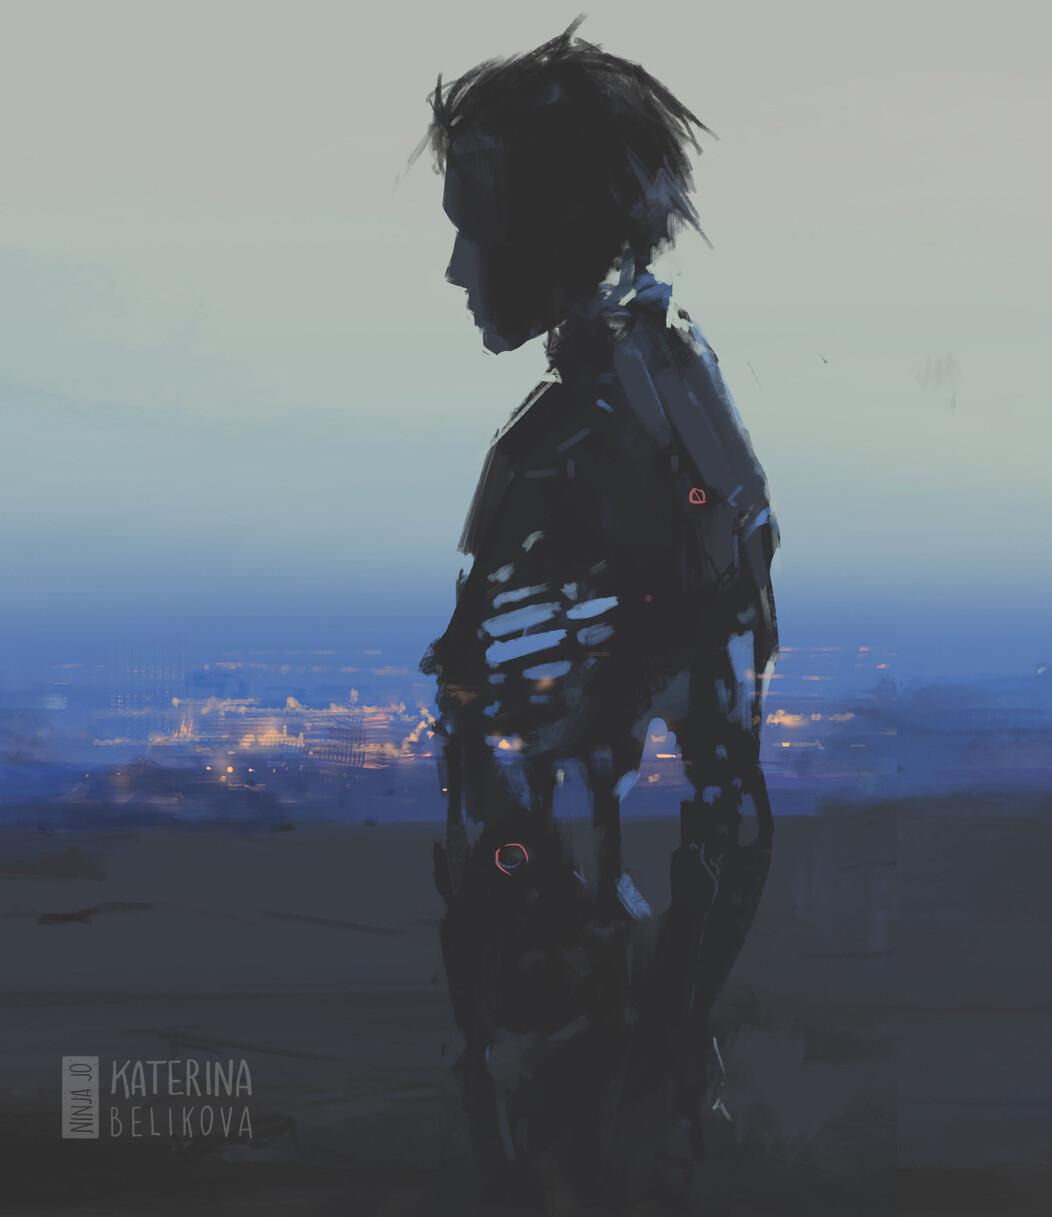 https://cdna.artstation.com/p/assets/images/images/026/302/150/large/ninja-jo-196-tvviu3nl3bq.jpg